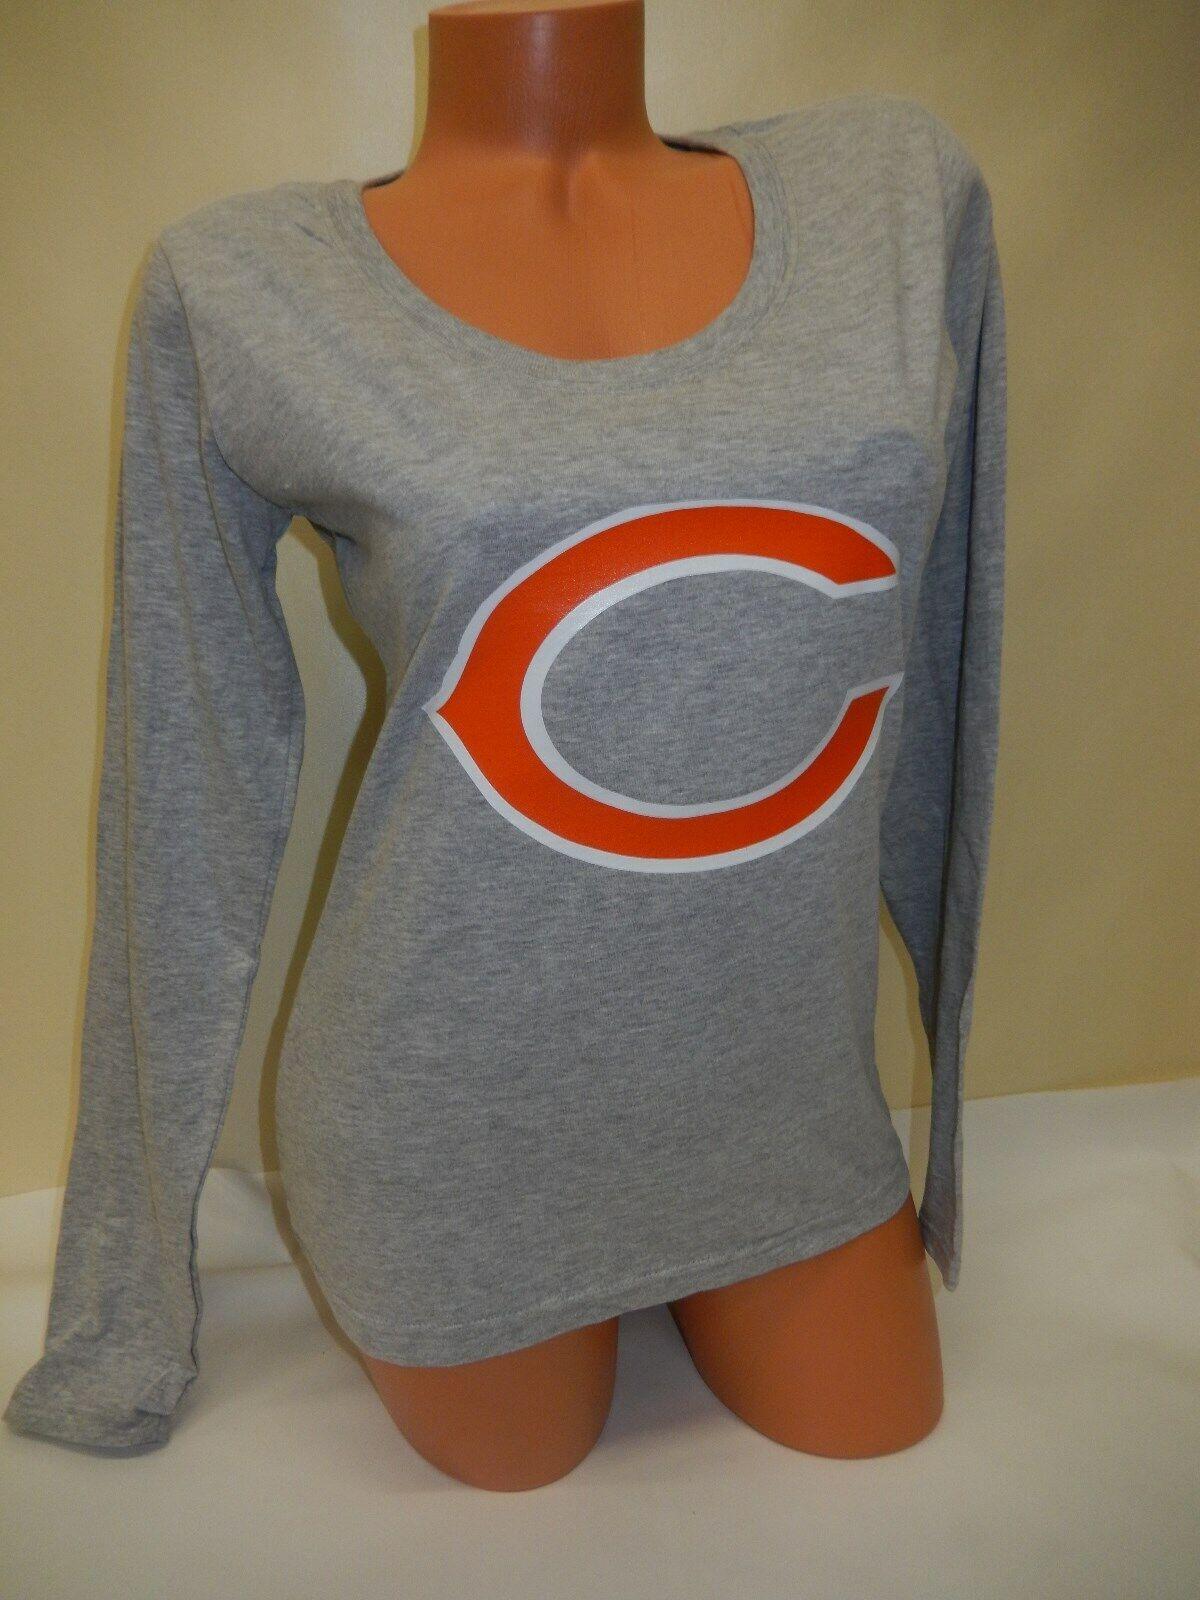 9822 nfl apparel womens ladies chicago bears